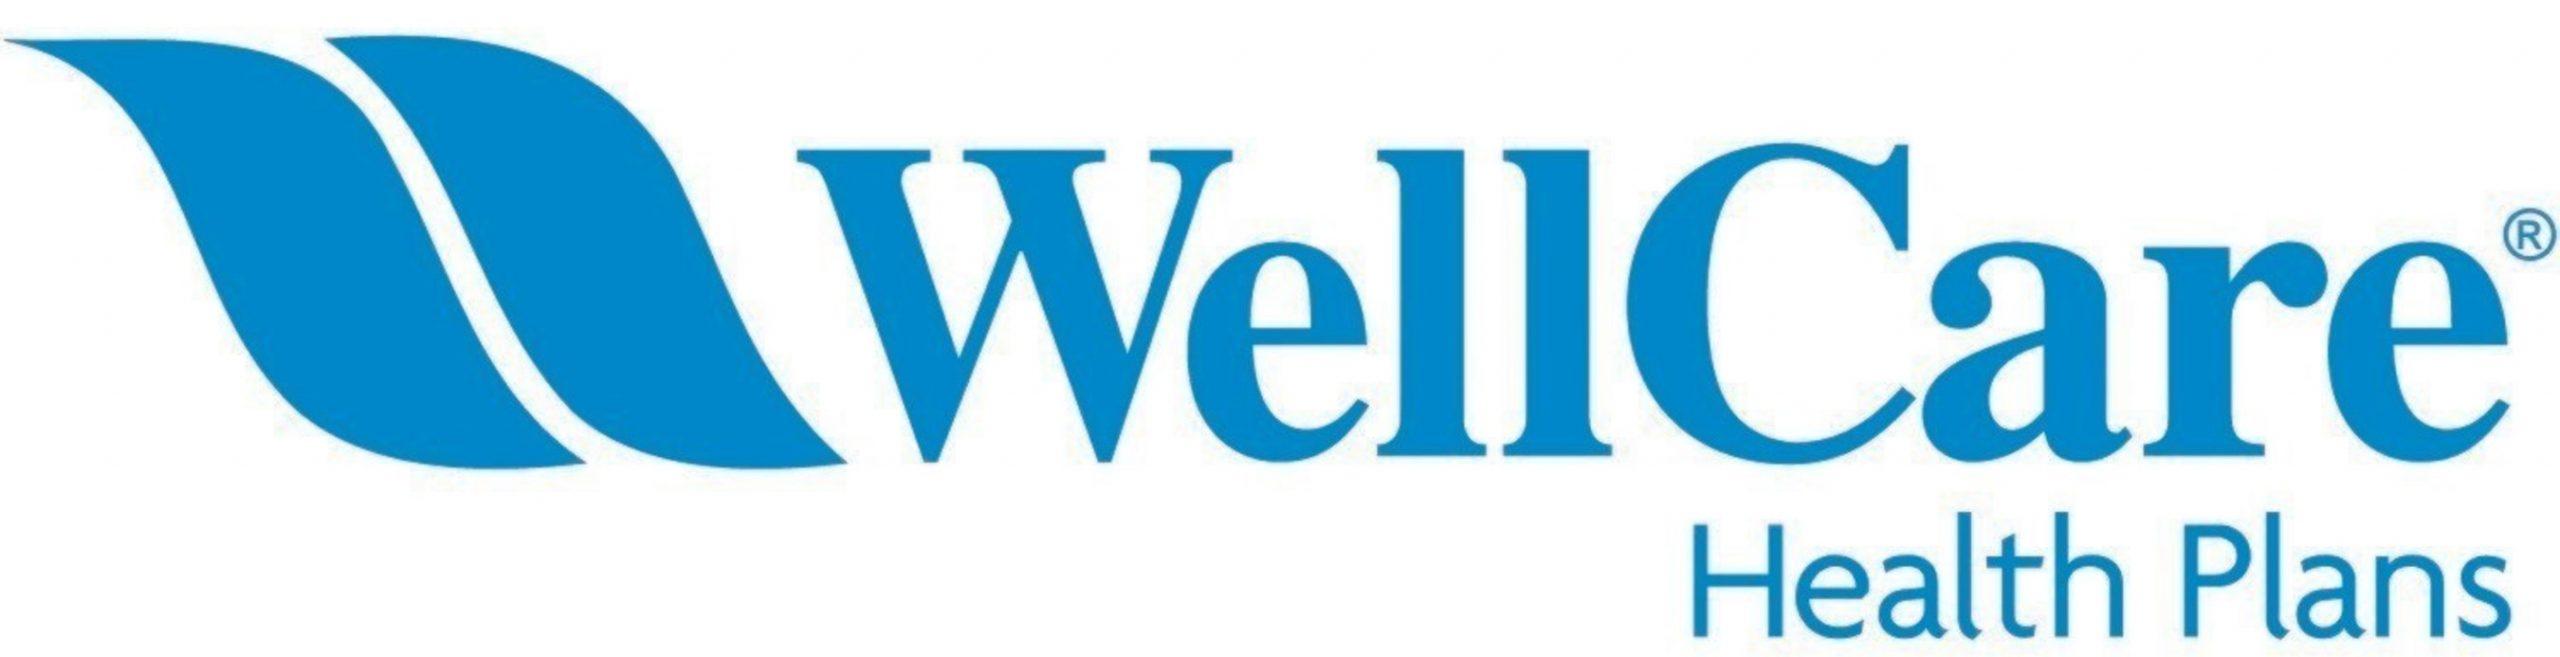 WellCare Health Plans, Inc. Logo (PRNewsFoto/WellCare Health Plans, Inc.)